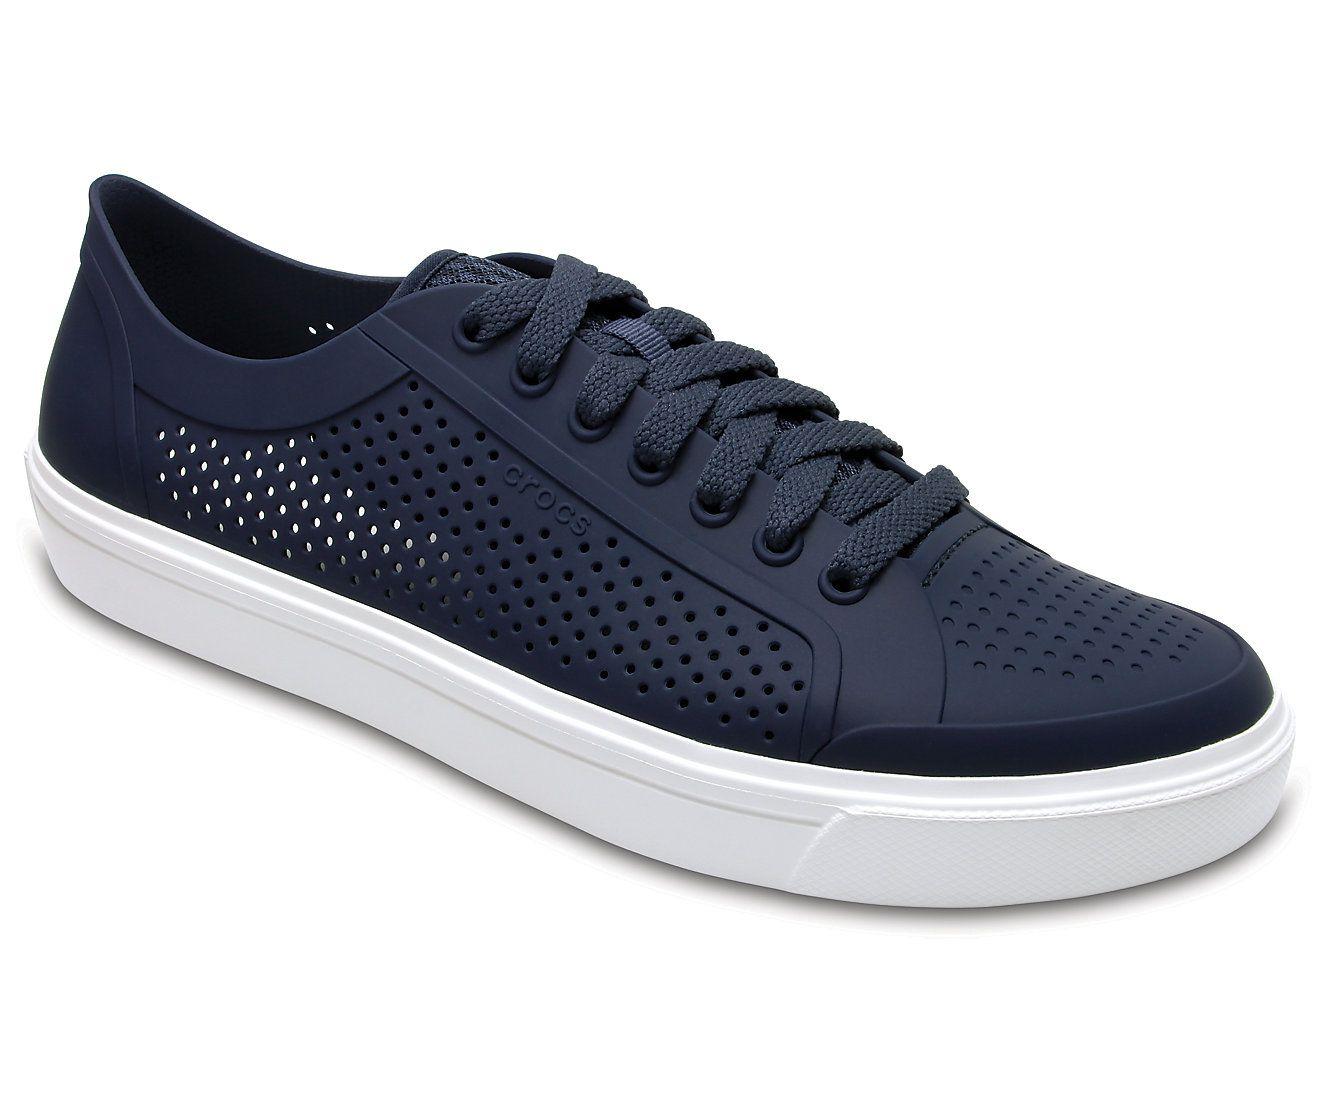 1281f0719f Crocs Citilane Roka Court Lifestyle Navy Casual Shoes - Buy Crocs Citilane  Roka Court Lifestyle Navy Casual Shoes Online at Best Prices in India on  Snapdeal